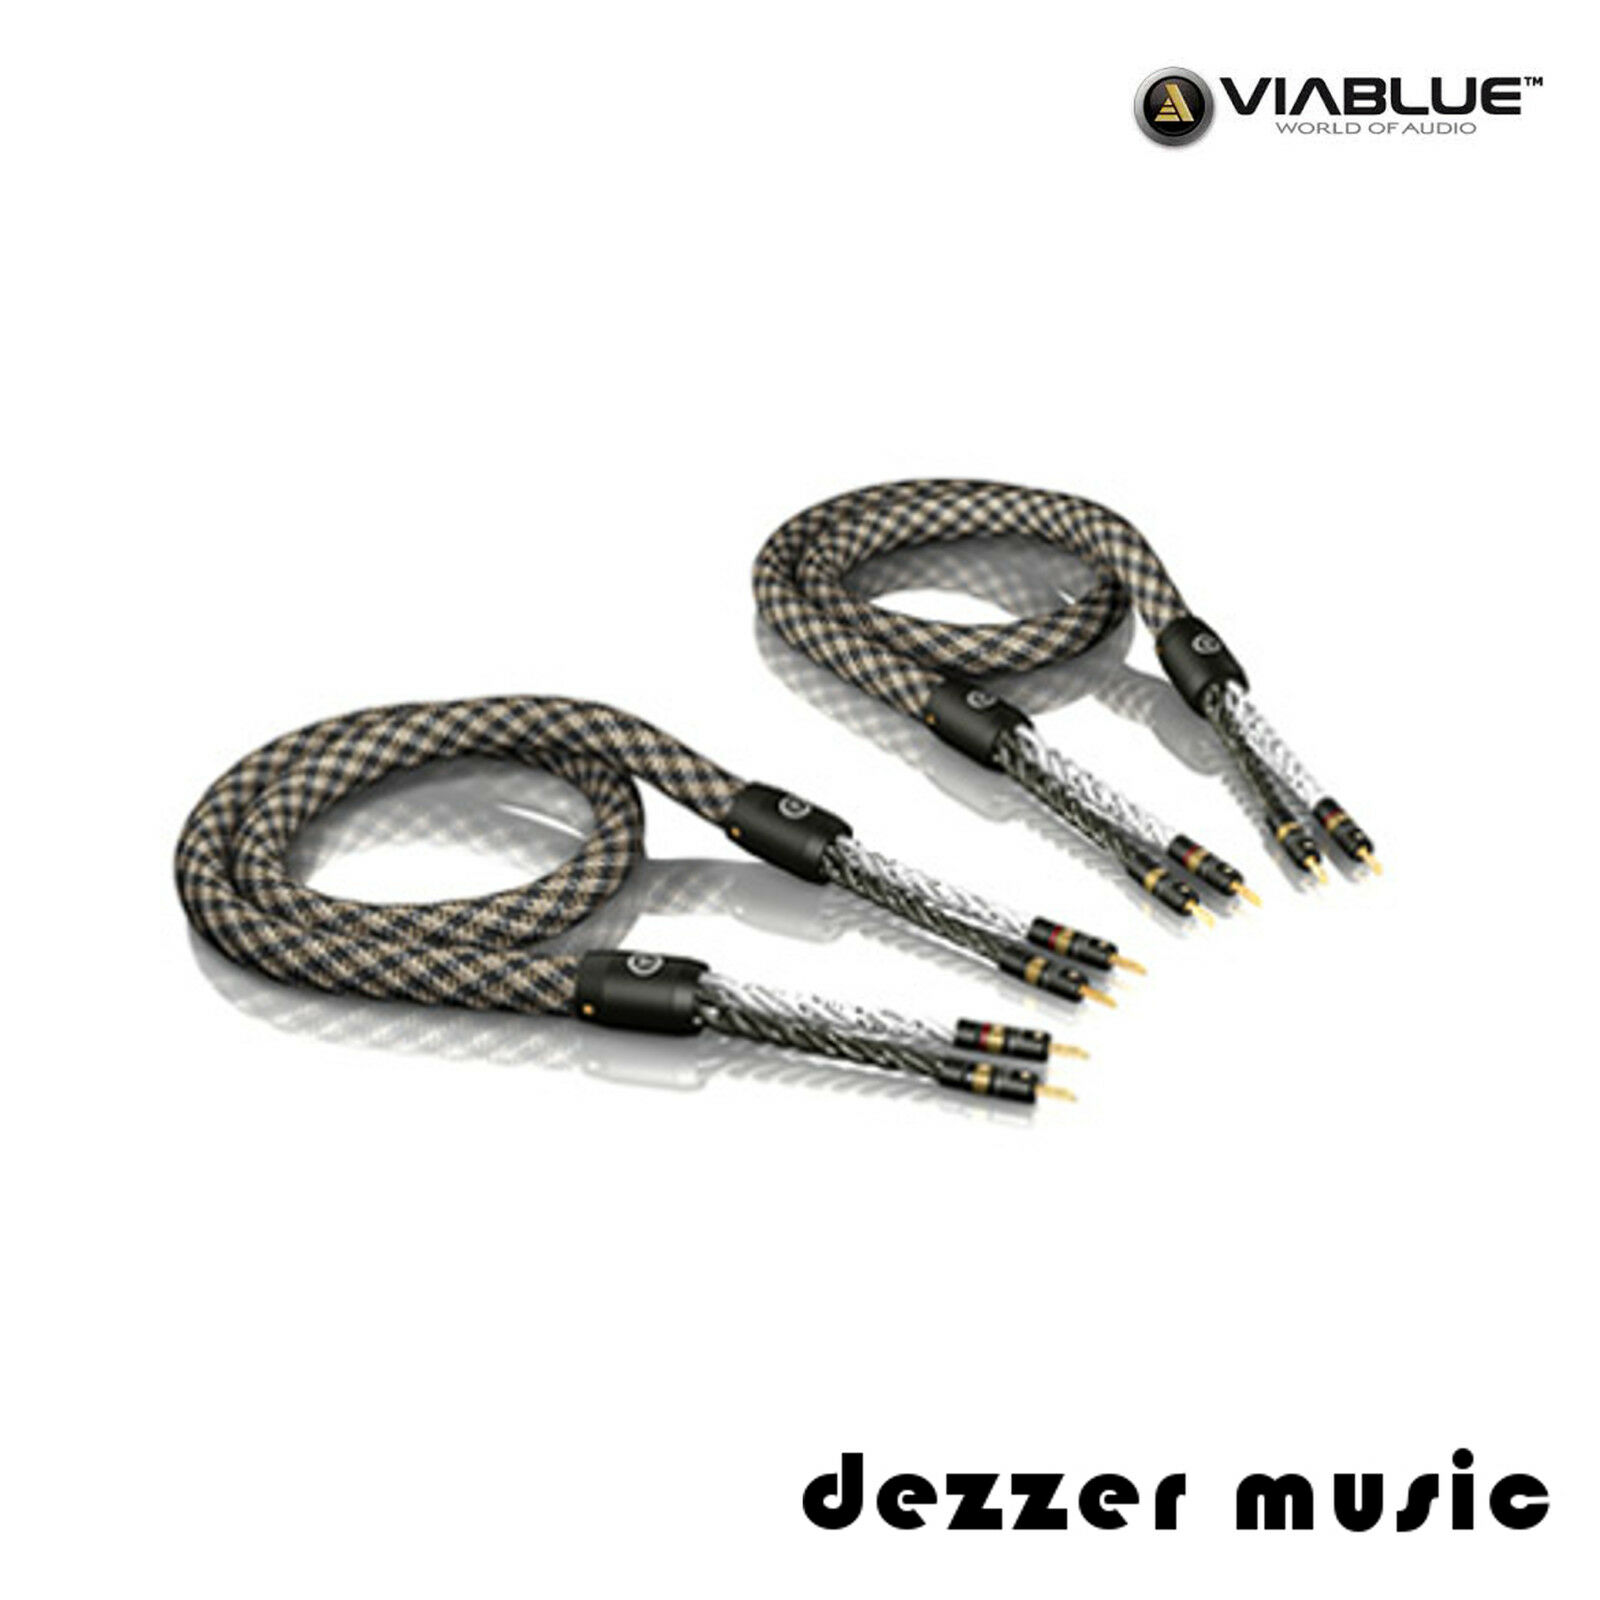 2x3 00m ViaBlue Sc-6 Air Silver mit Bananas T6s / Ls-kabel Single ...